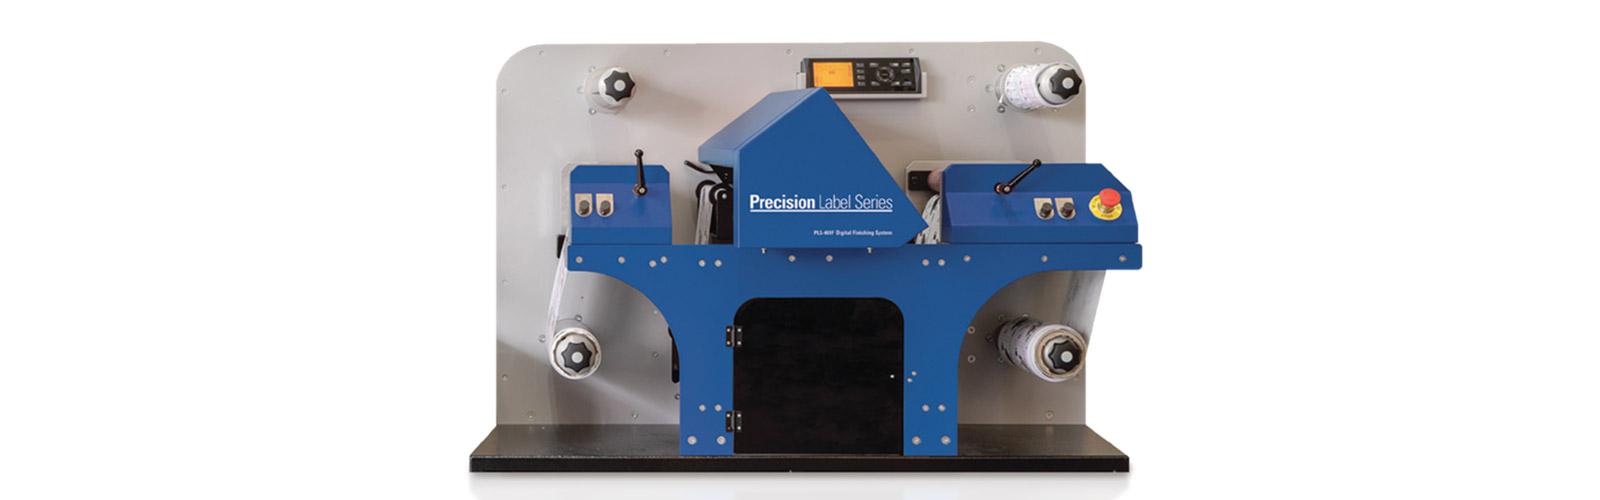 Precision Label Series PLS-401f